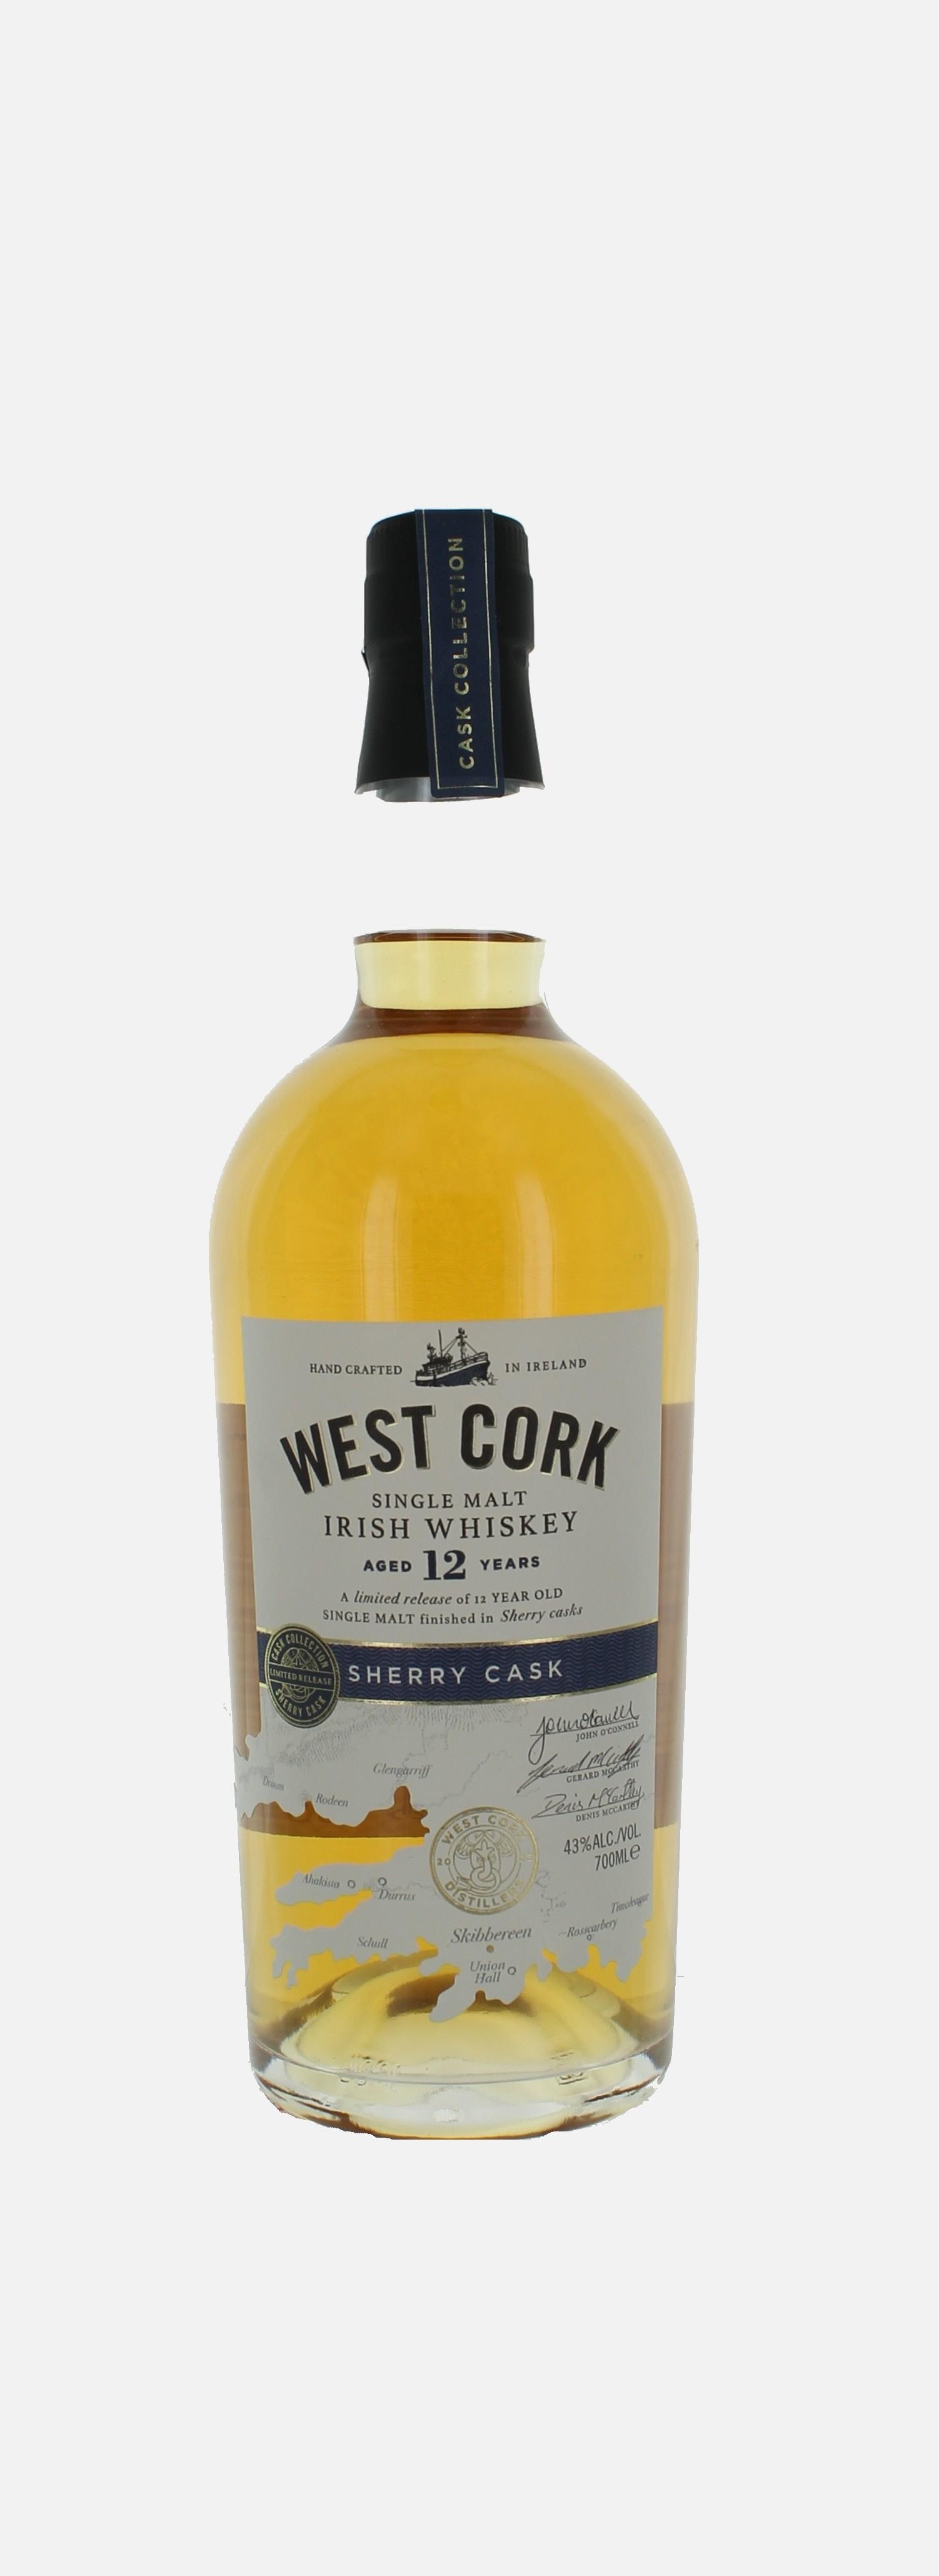 West Cork Port cask 12 , Single Malt Irish Whiskey